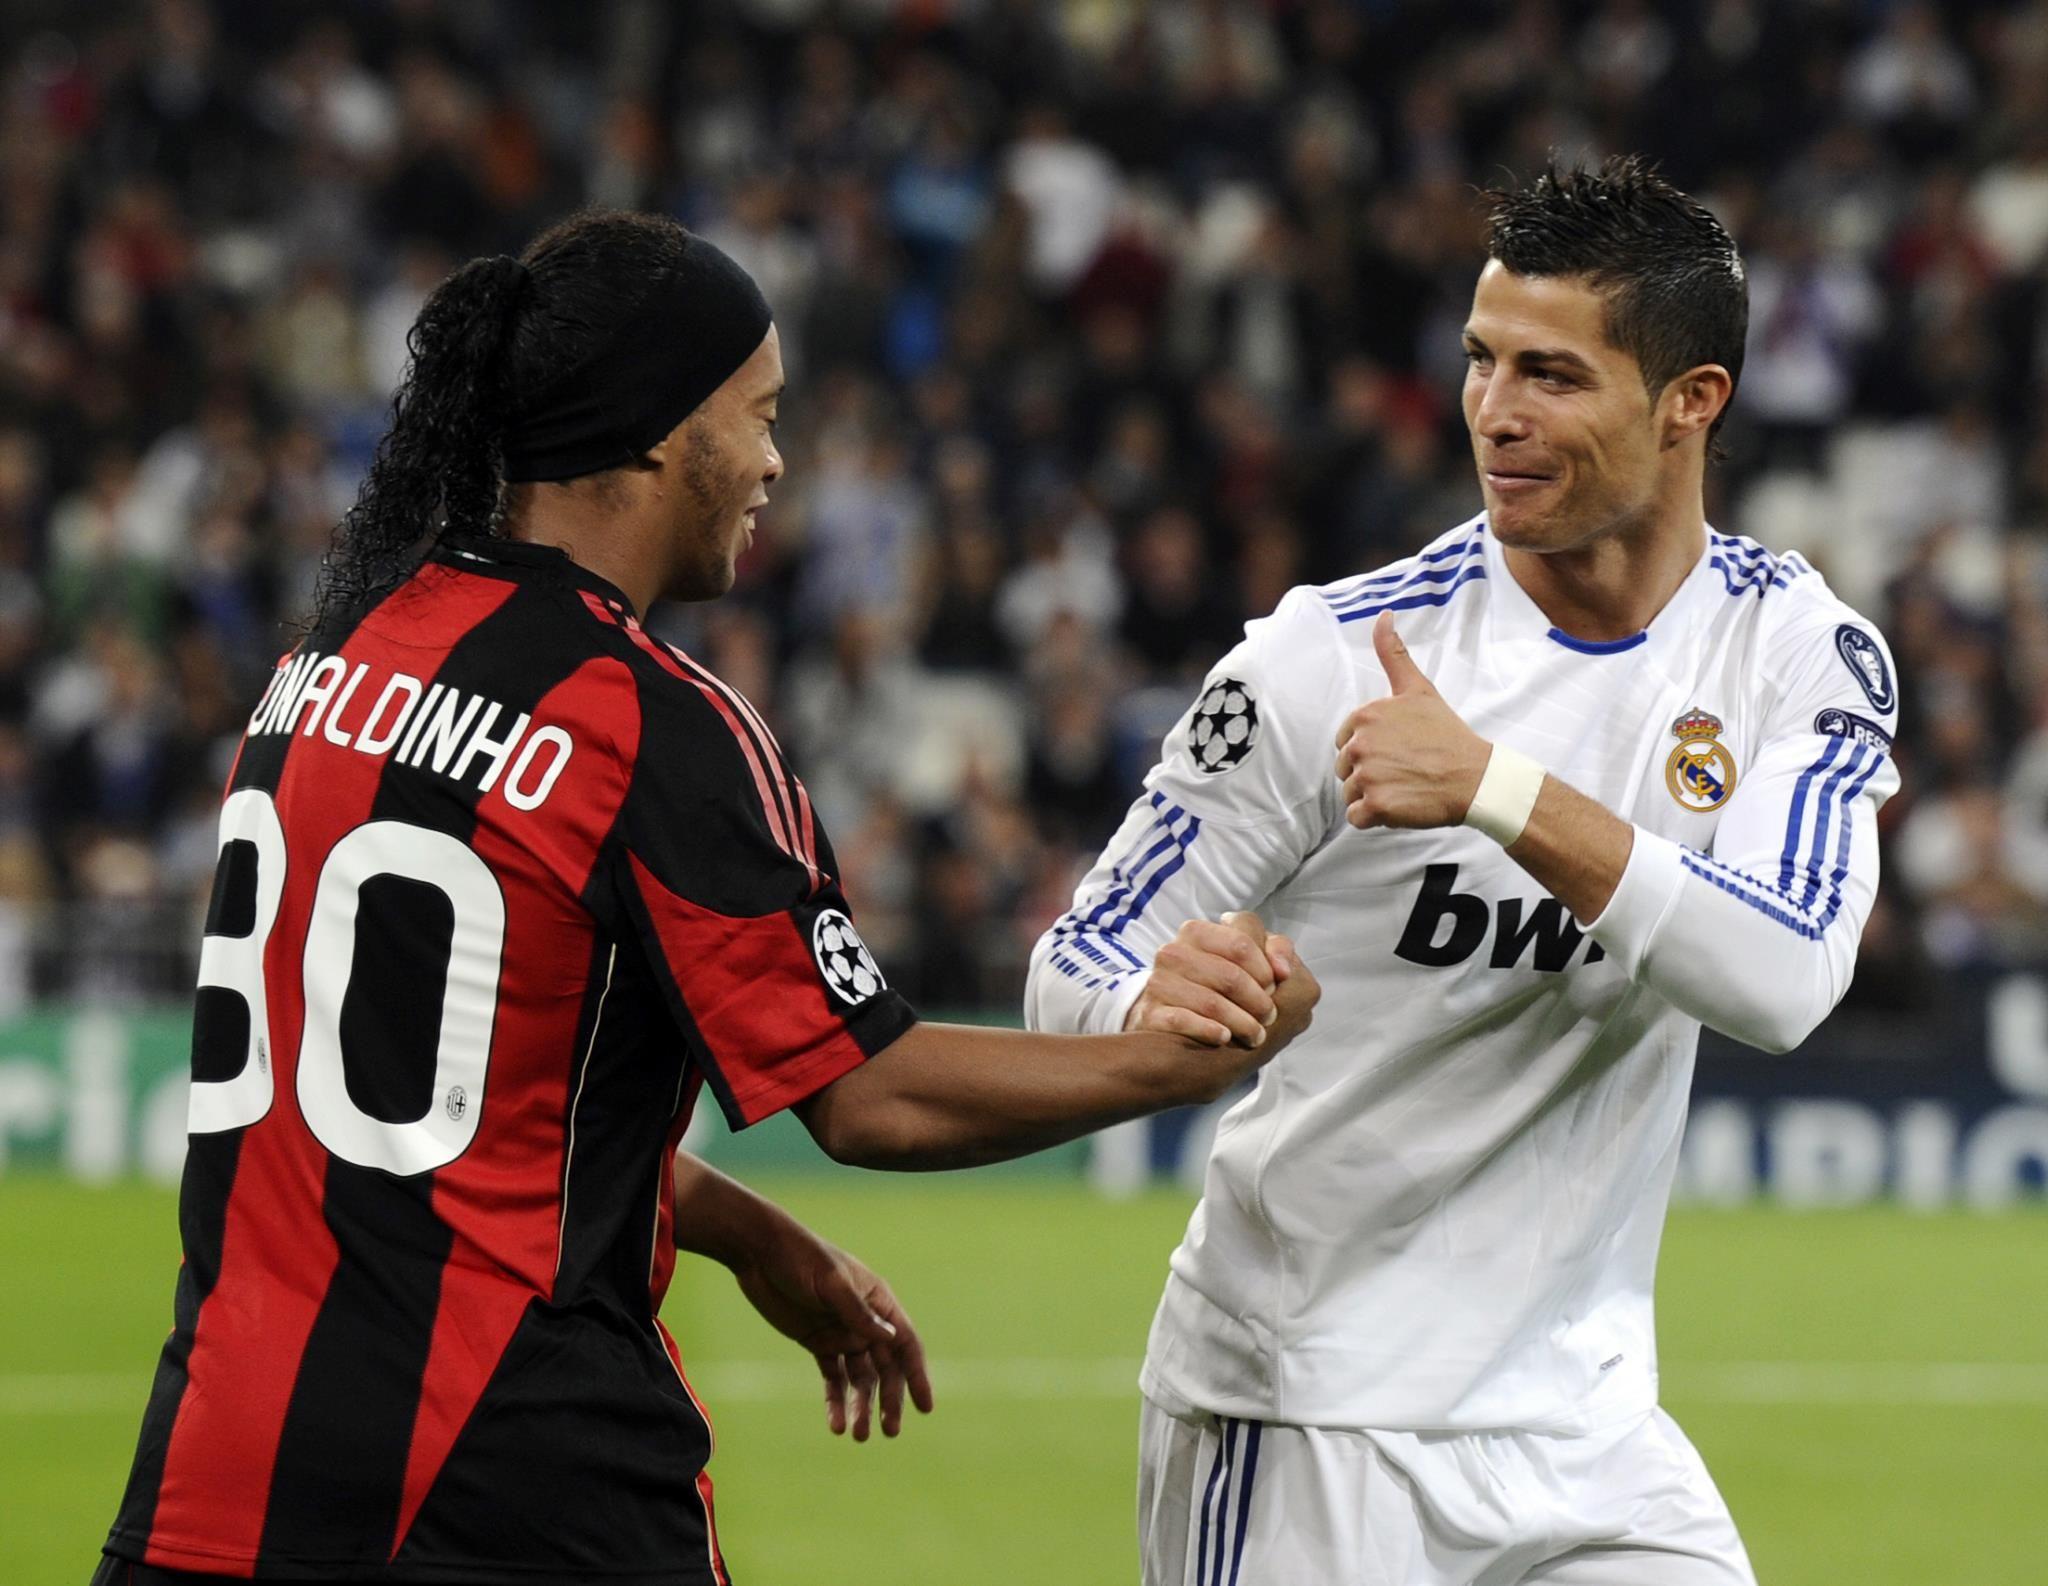 Ronaldinho (AC Milan) & Cristiano Ronaldo (Real Madrid)